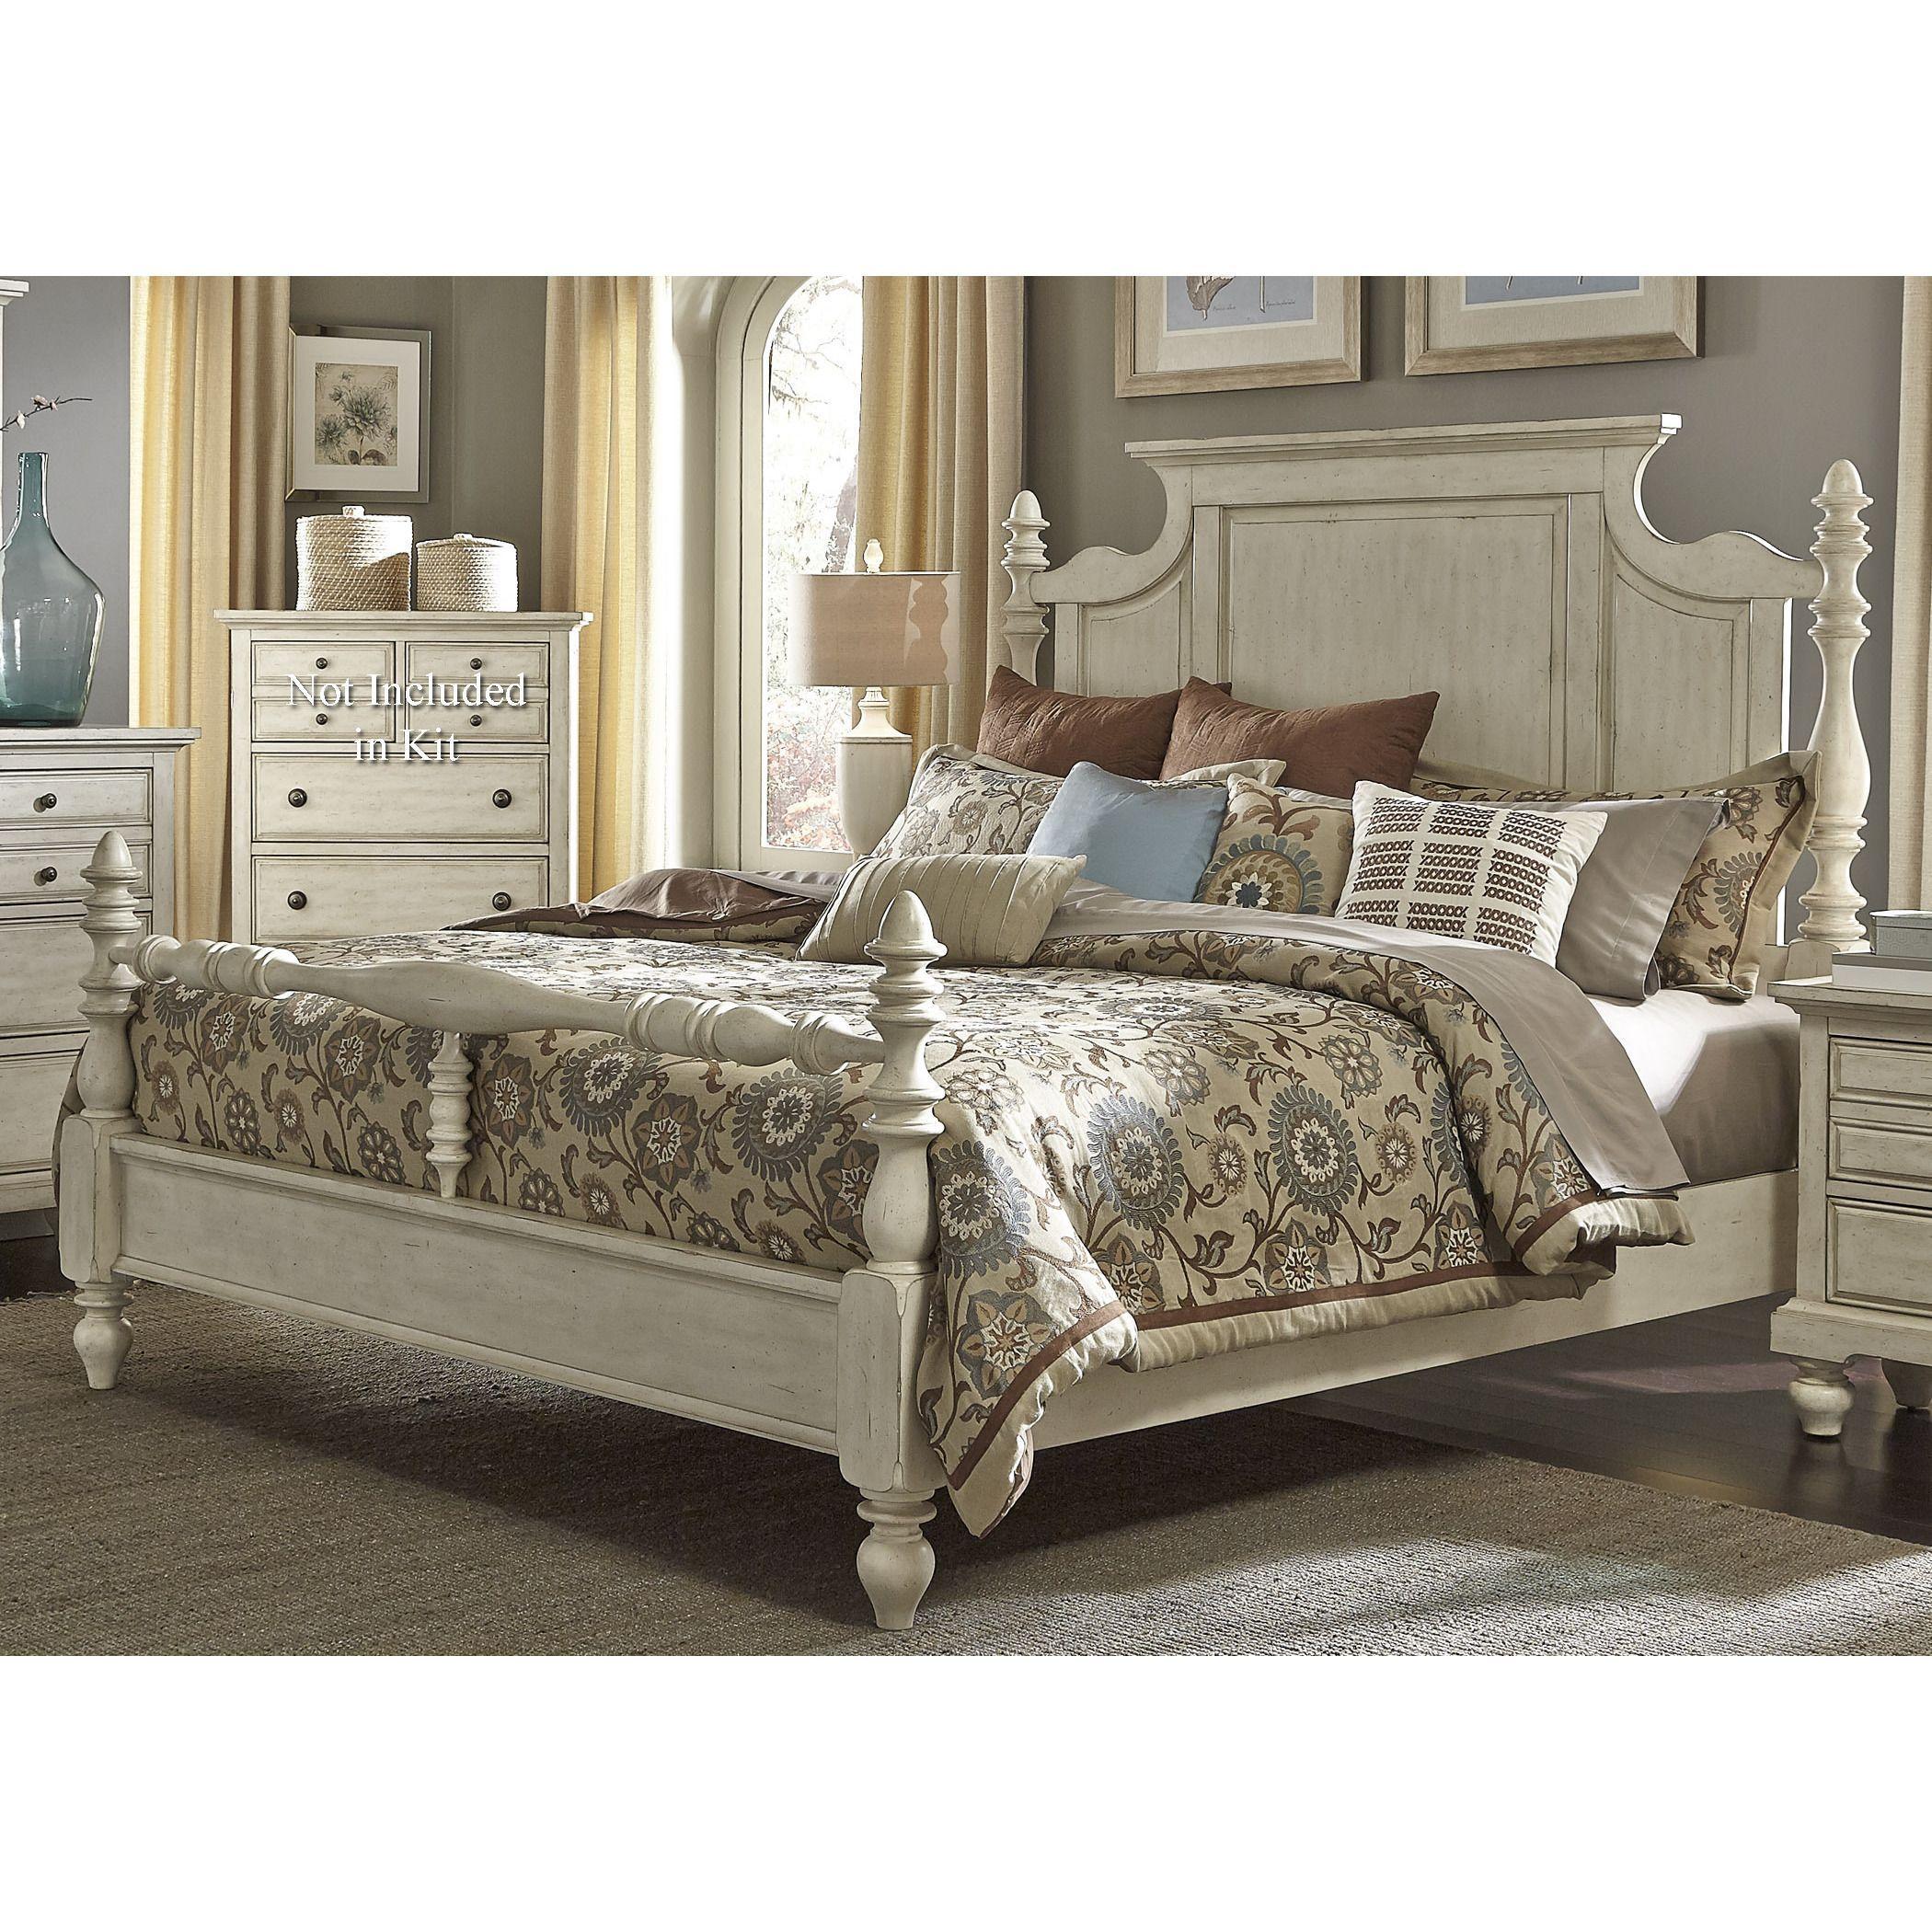 Whitewash Pine Bedroom Furniture